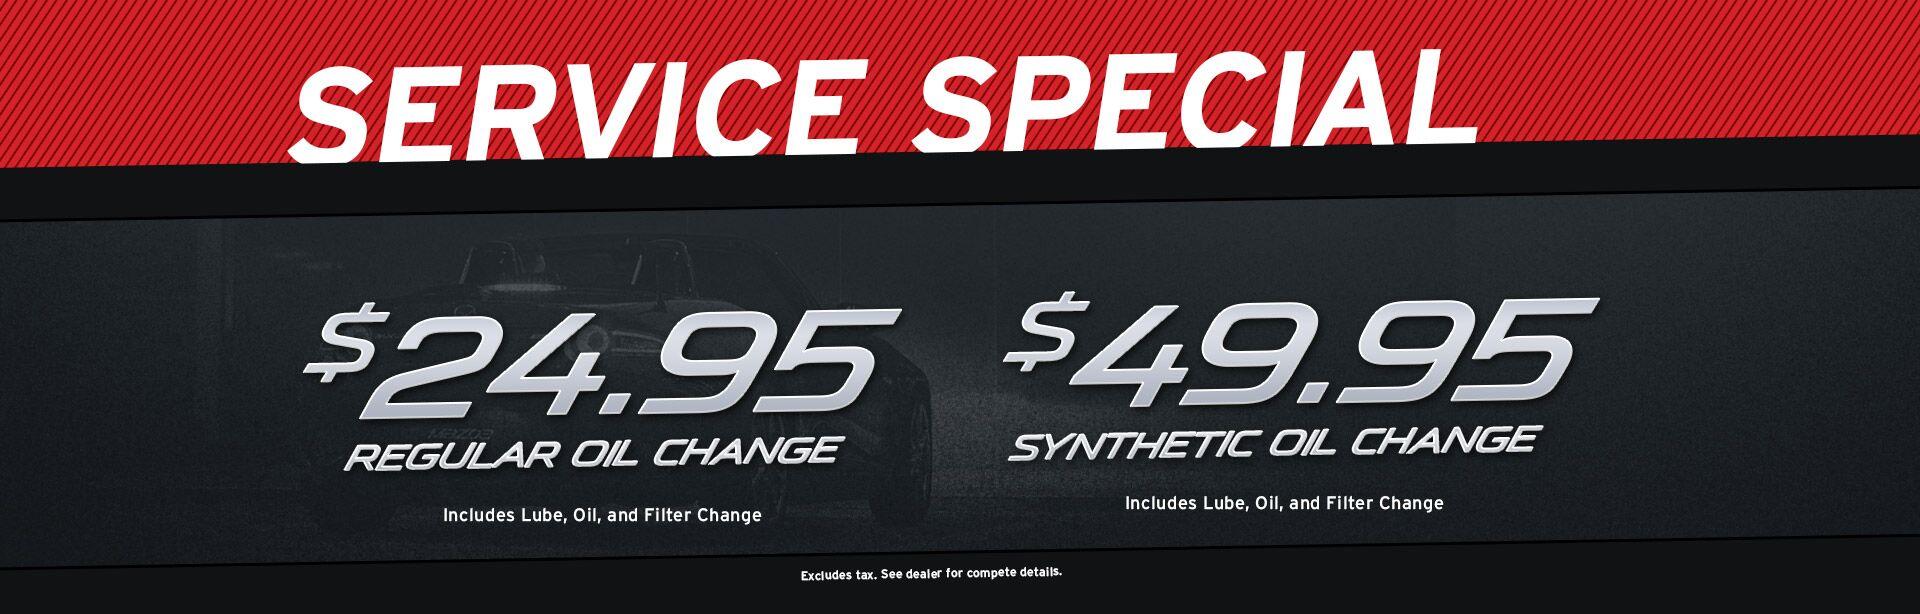 audi repair spencer change offer oil mesa facebook auto coupon ad